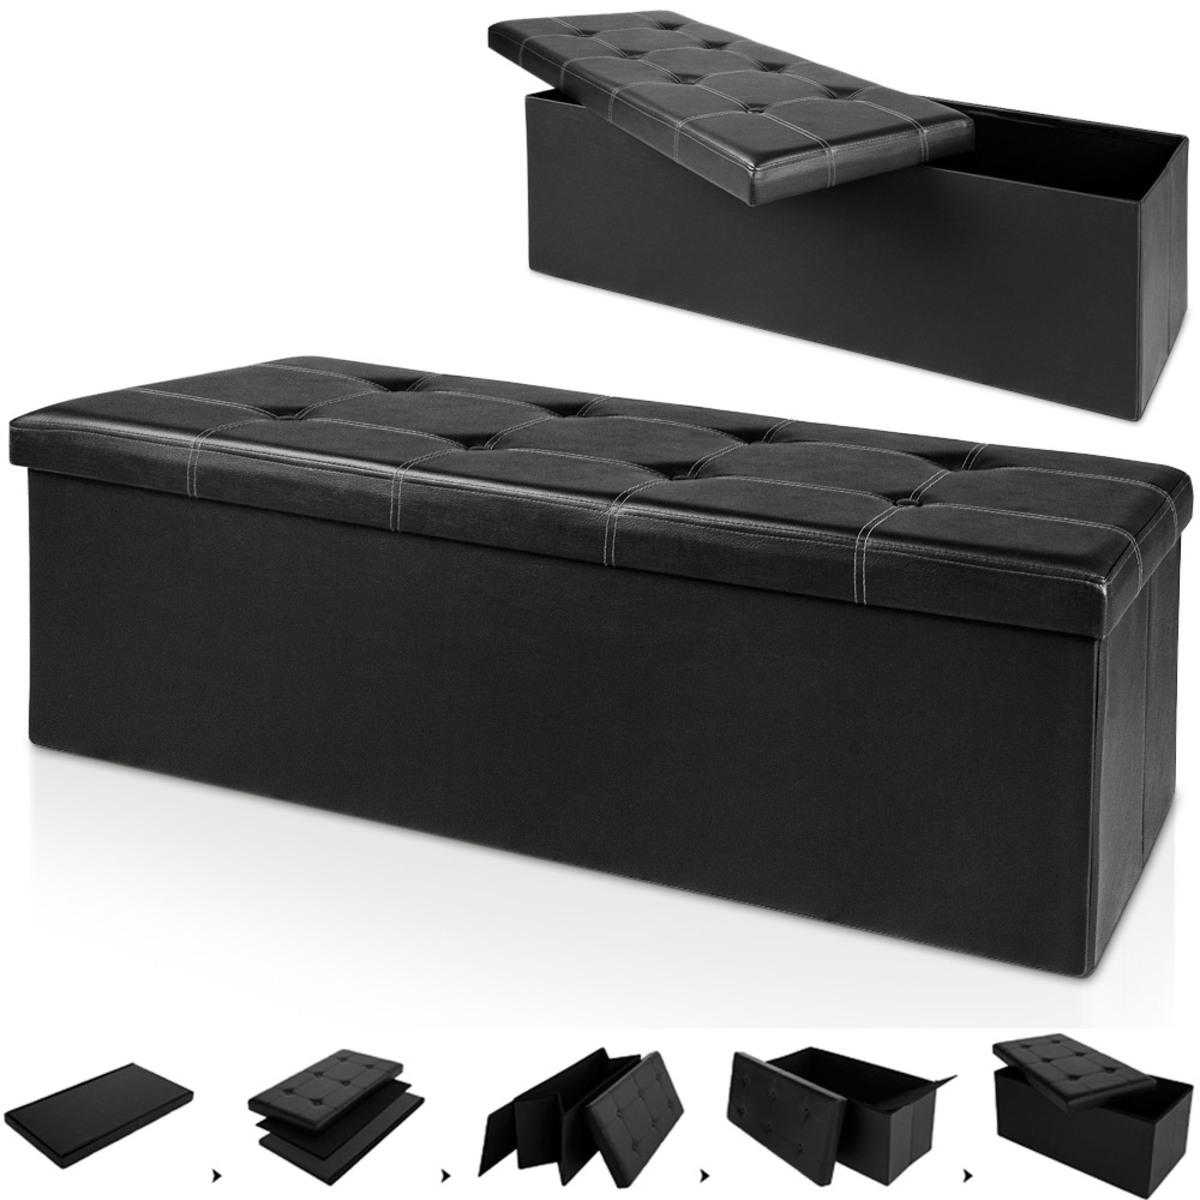 Bild 1 von Deuba Sitzbank/Sitztruhe schwarz